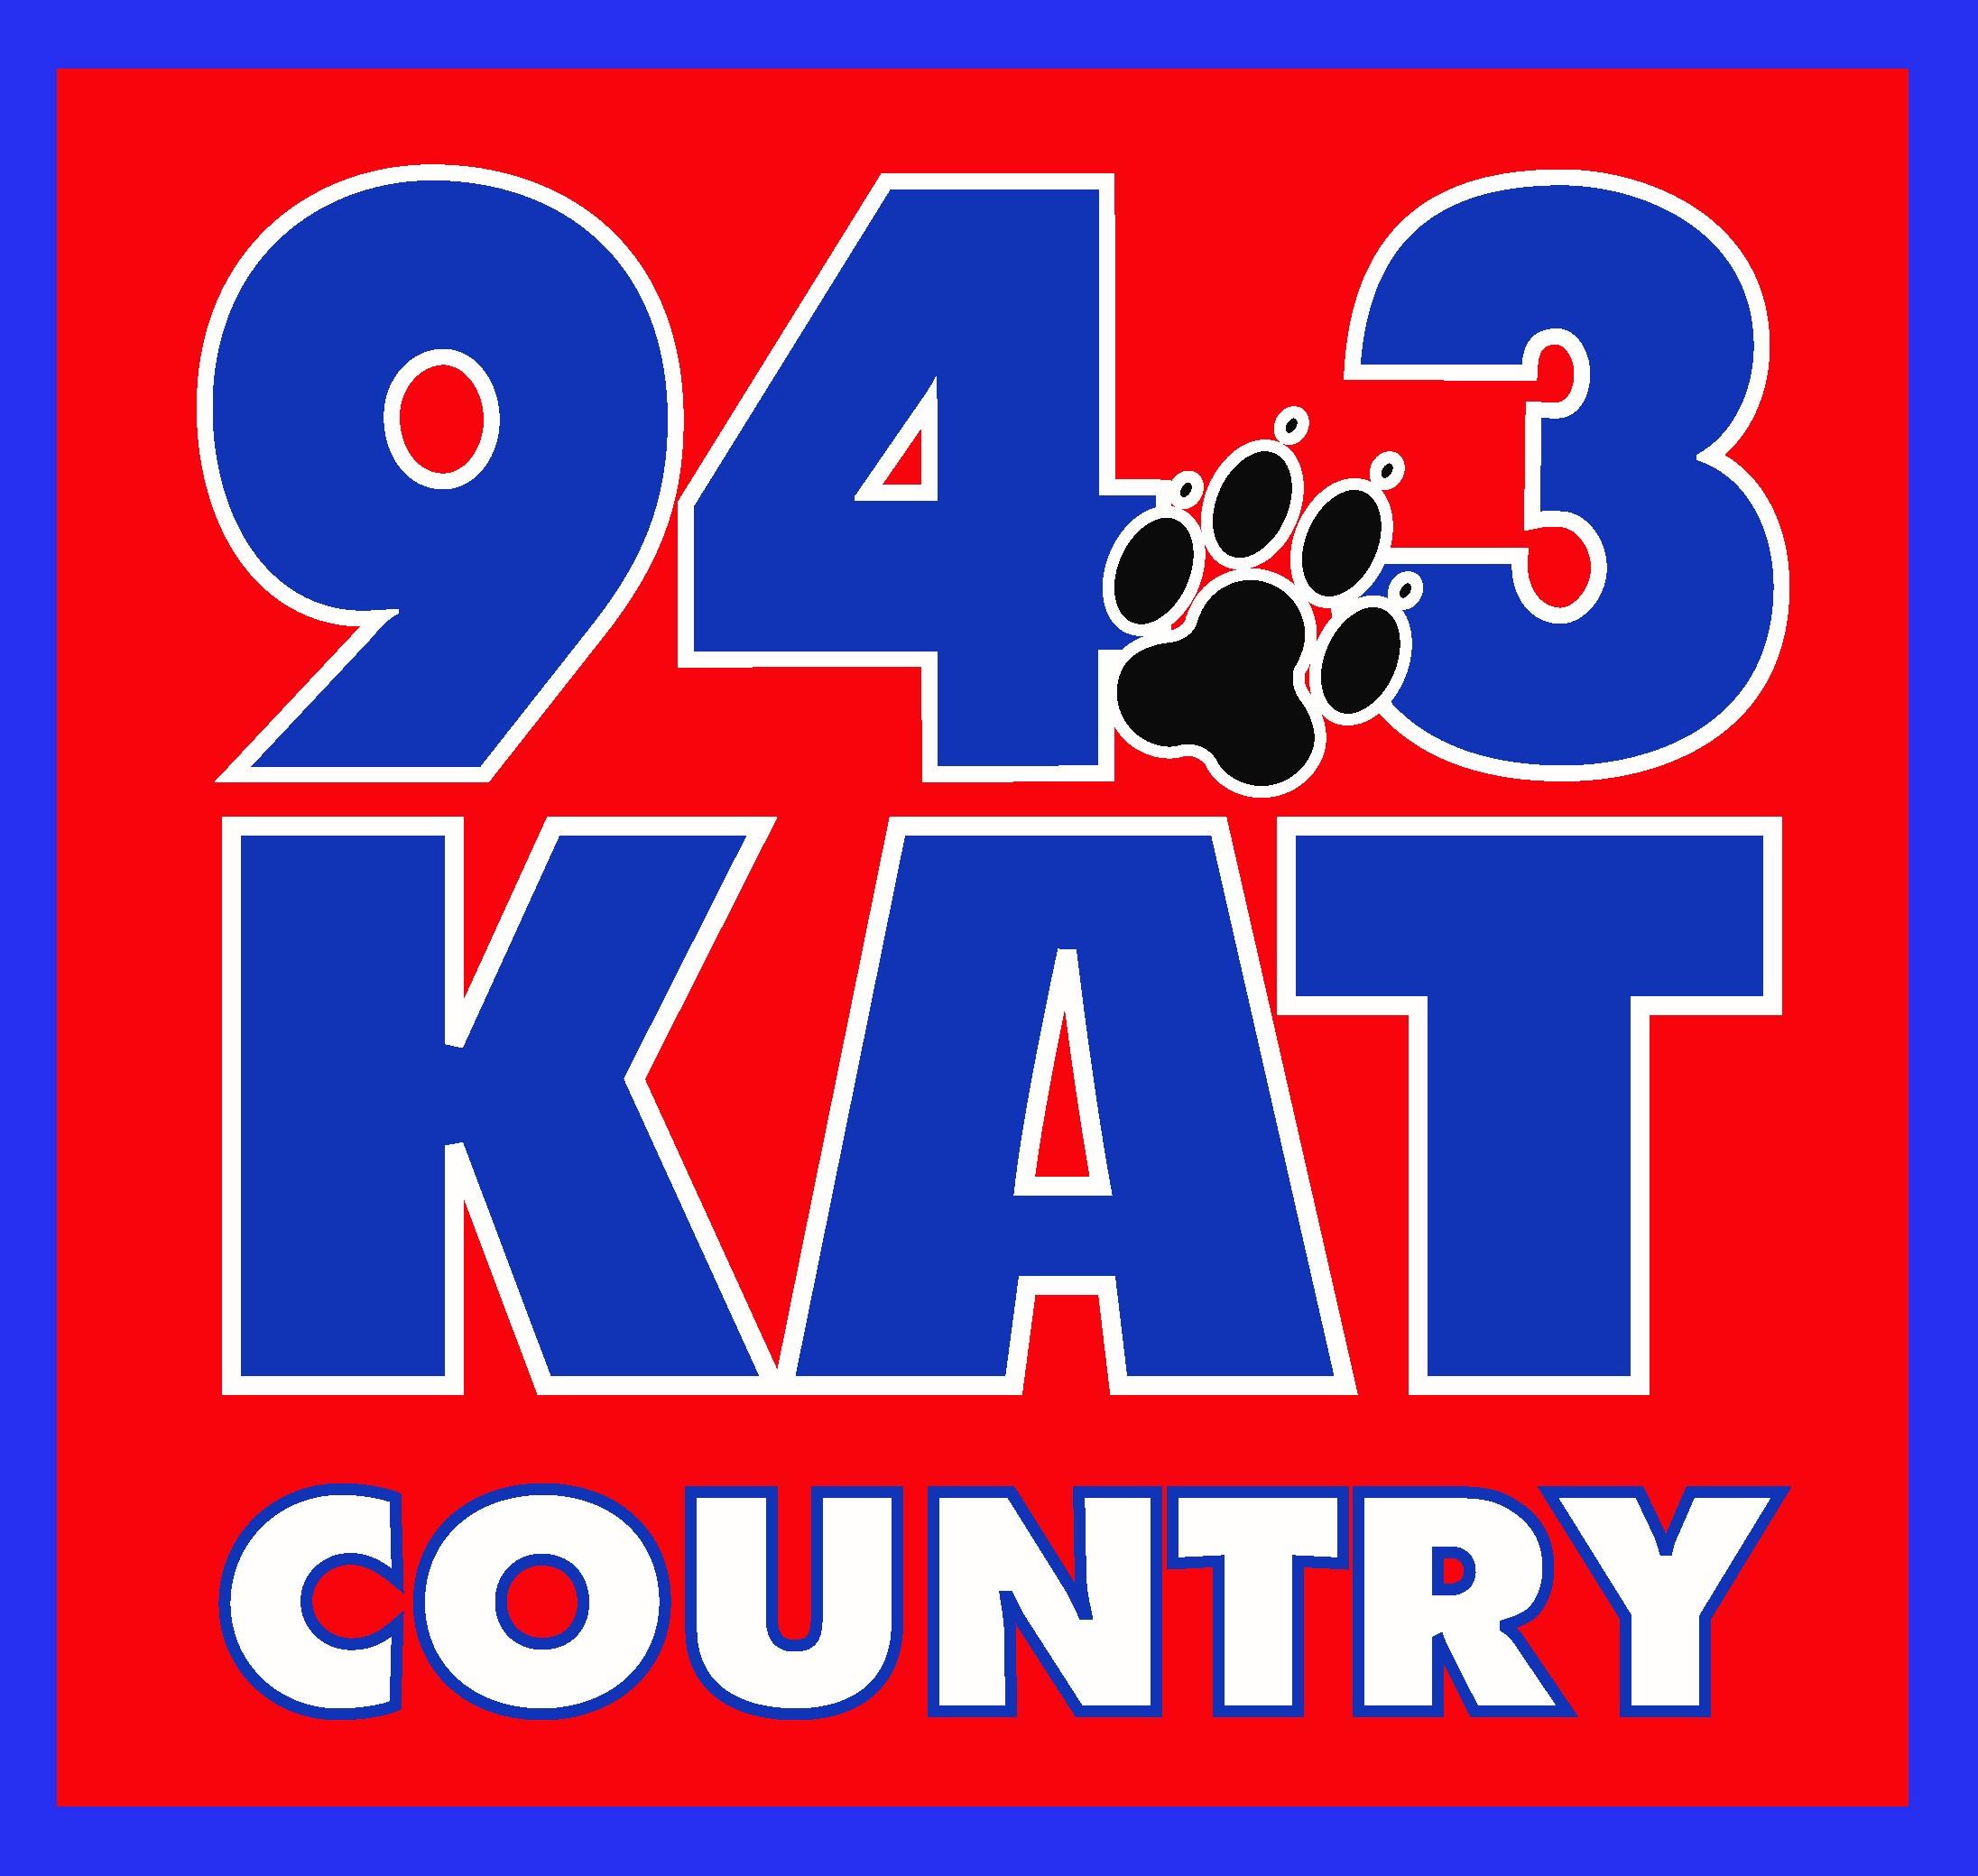 Media Partner: KAT Country